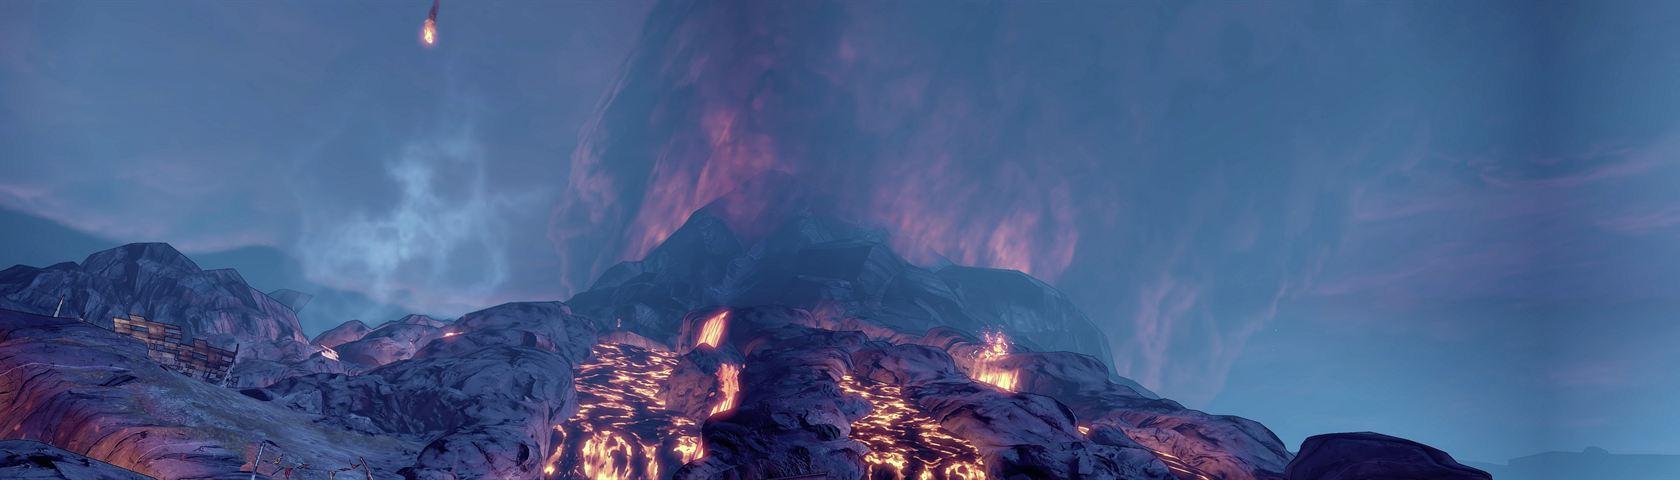 Borderlands 2 Volcano